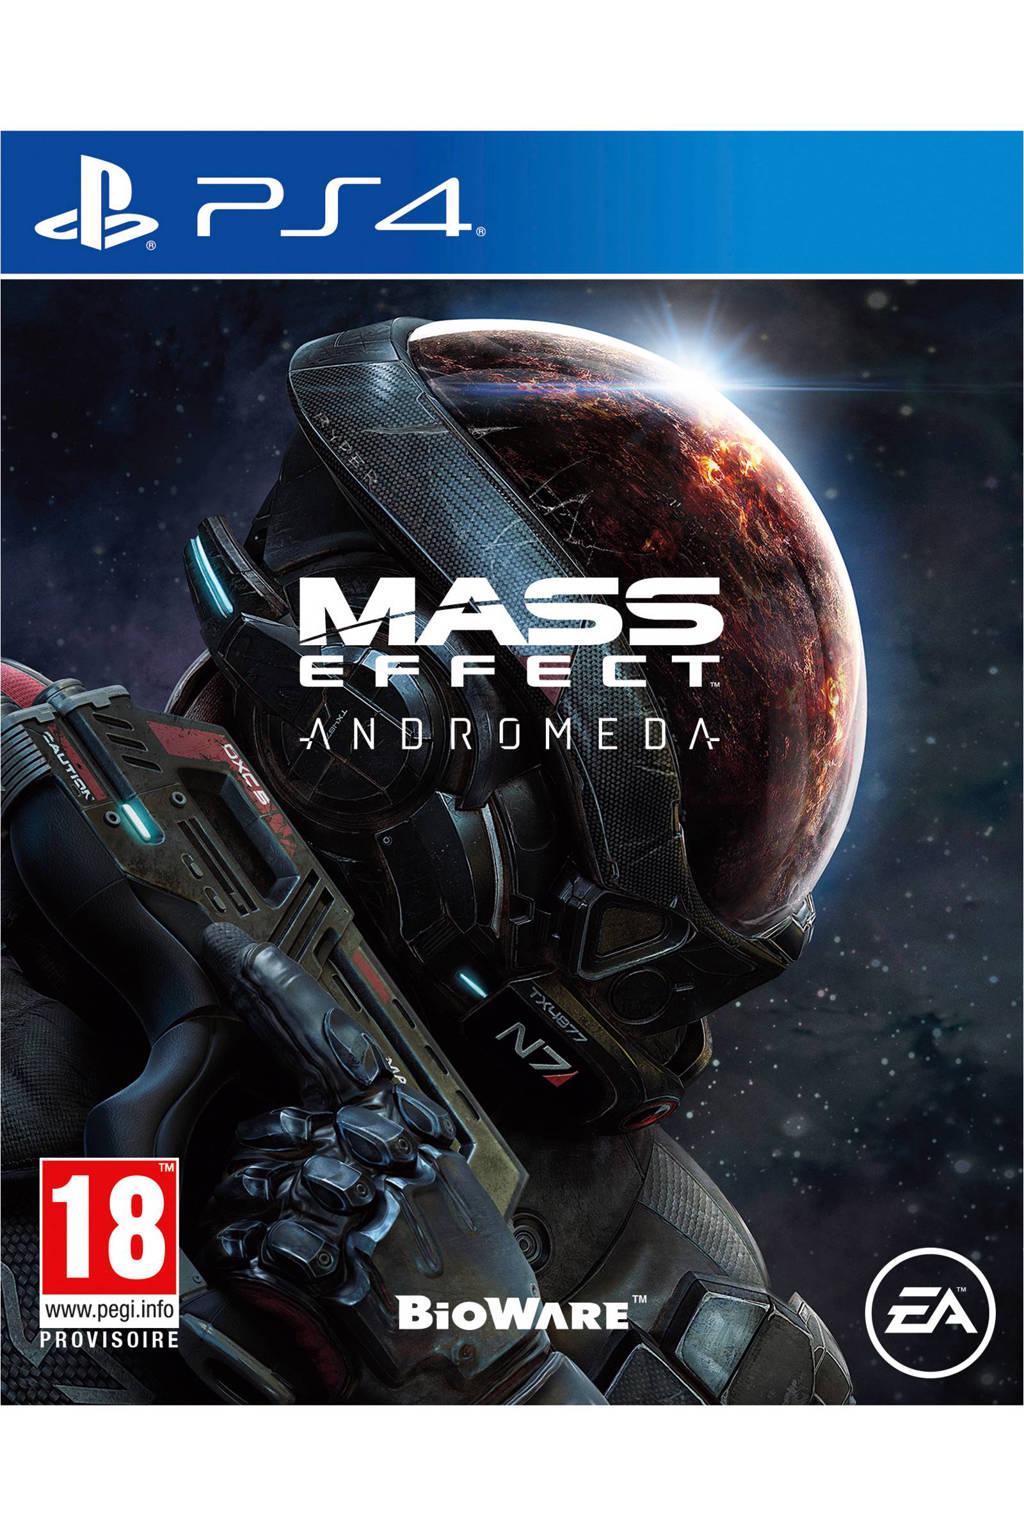 Mass Effect Andromeda (PlayStation 4), Sony PlayStation 4